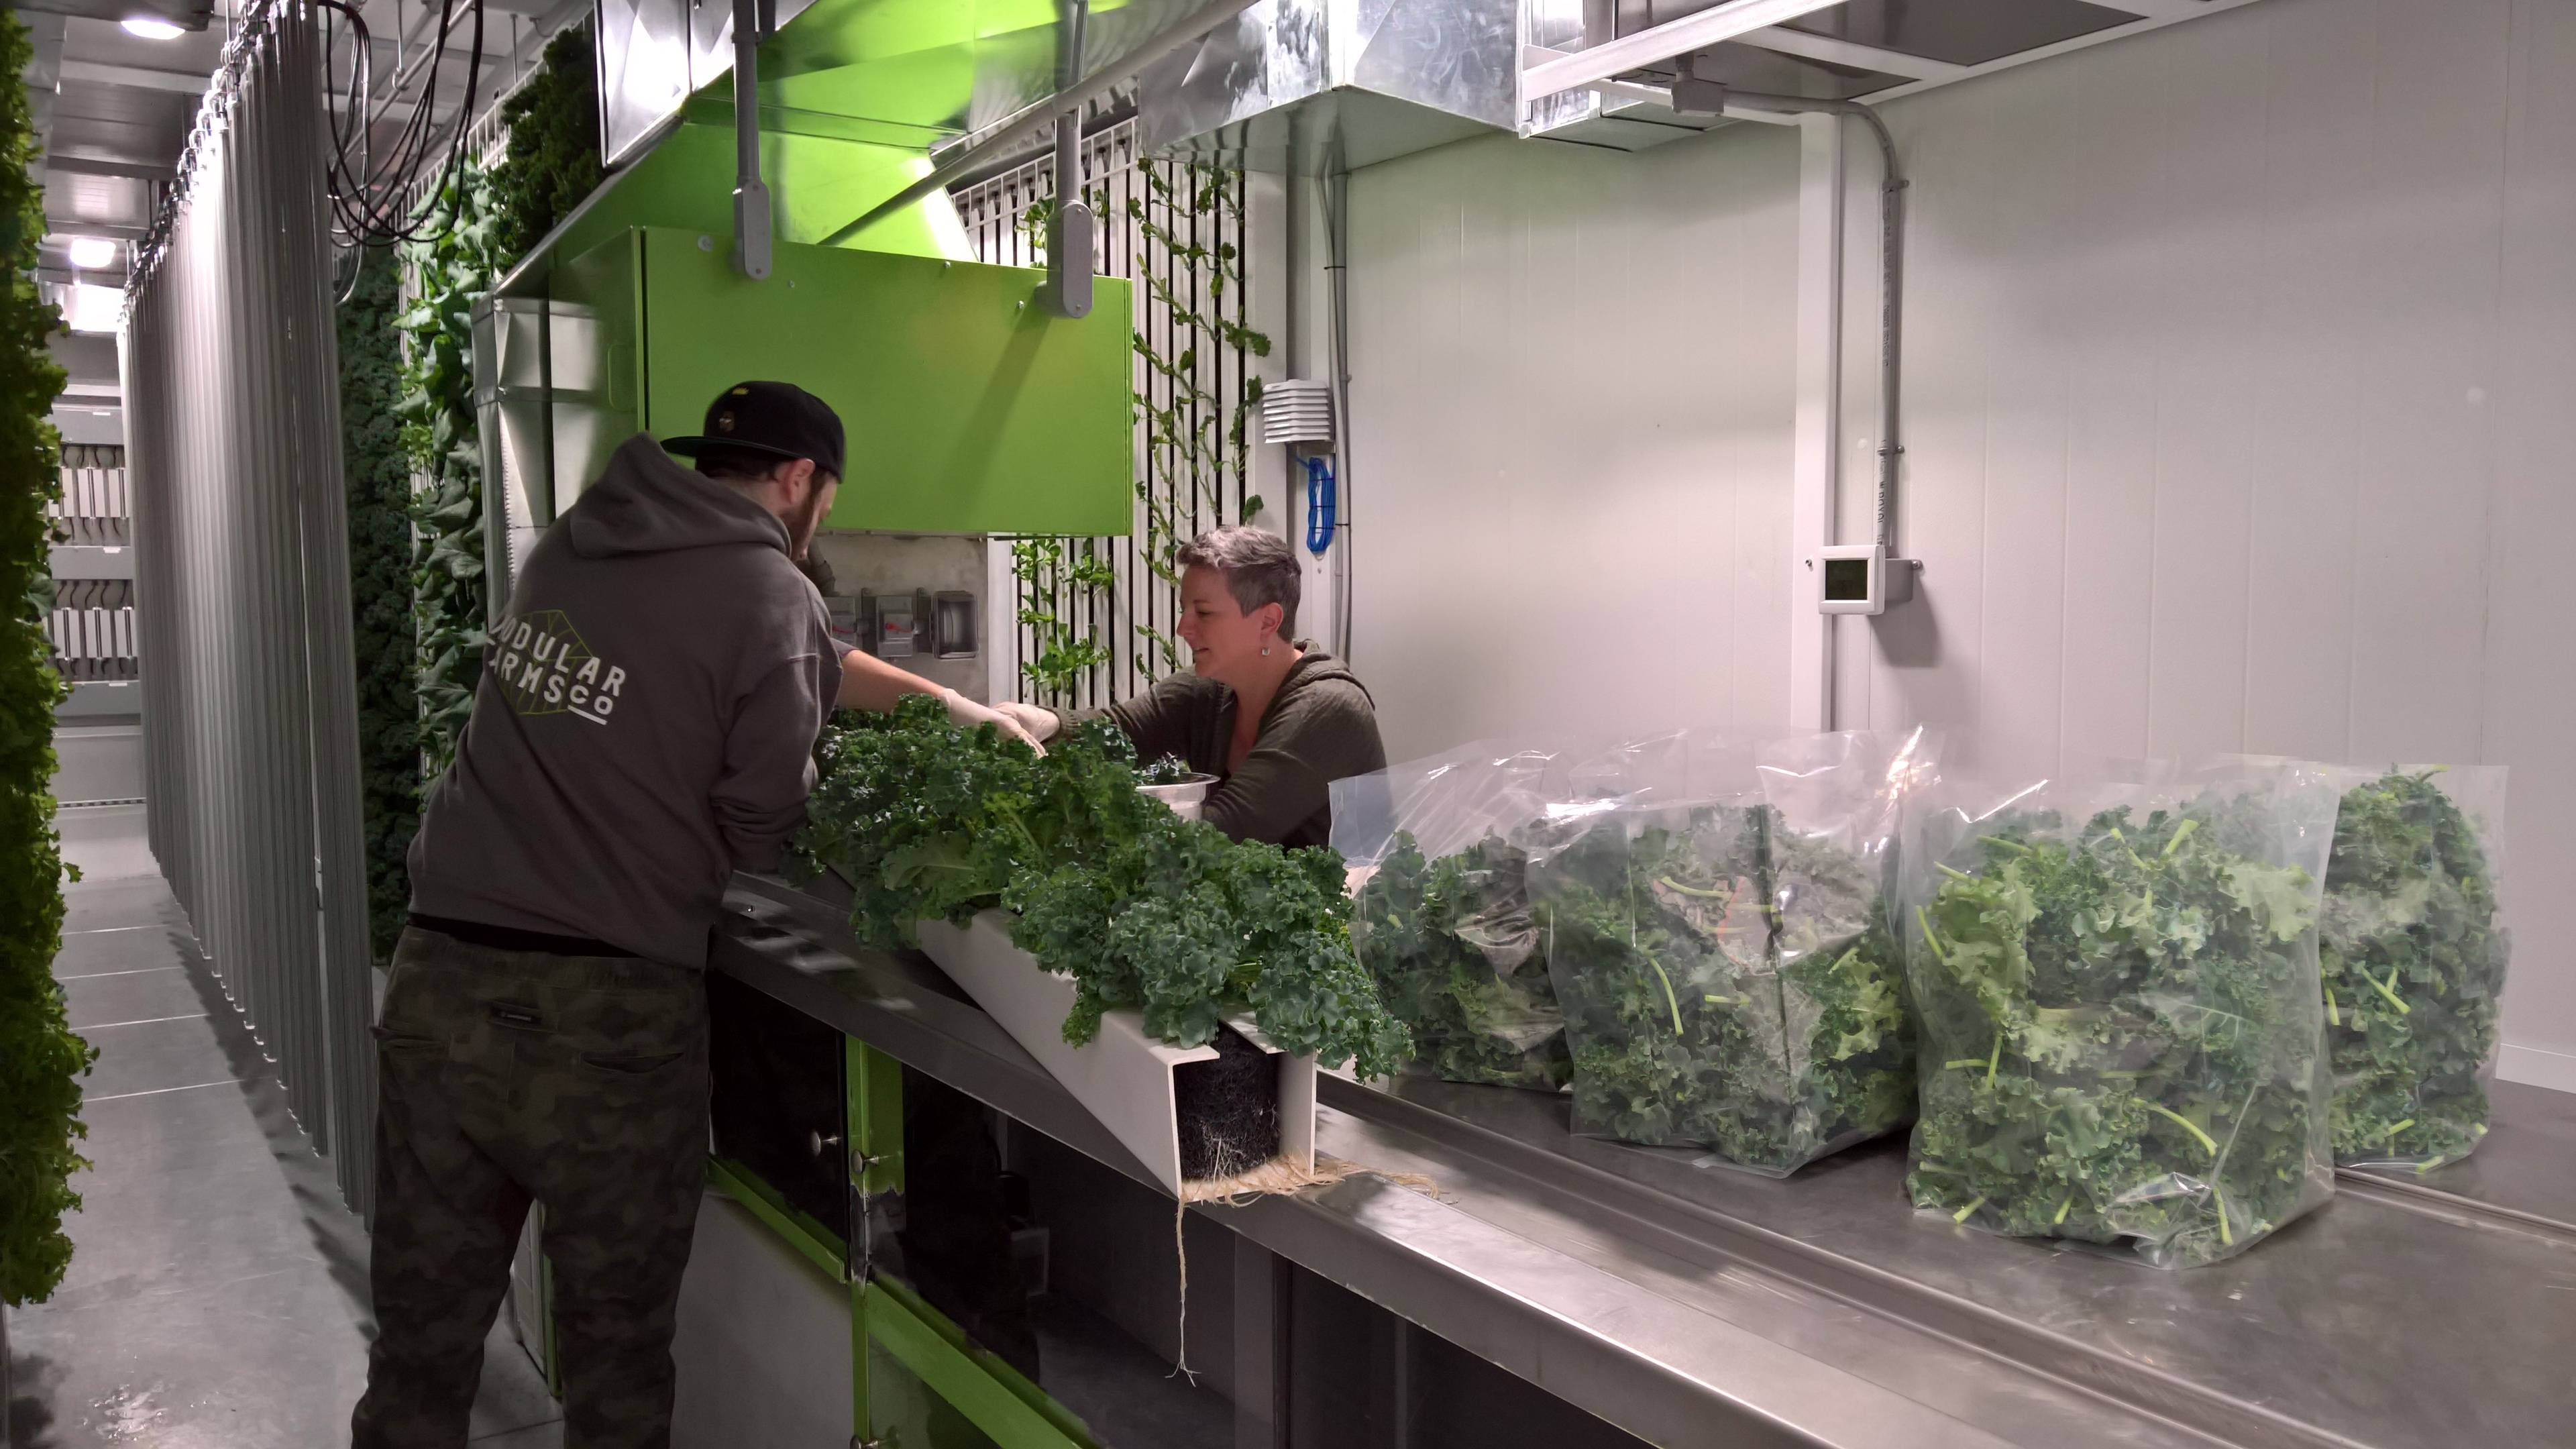 modular farms urban farming kale